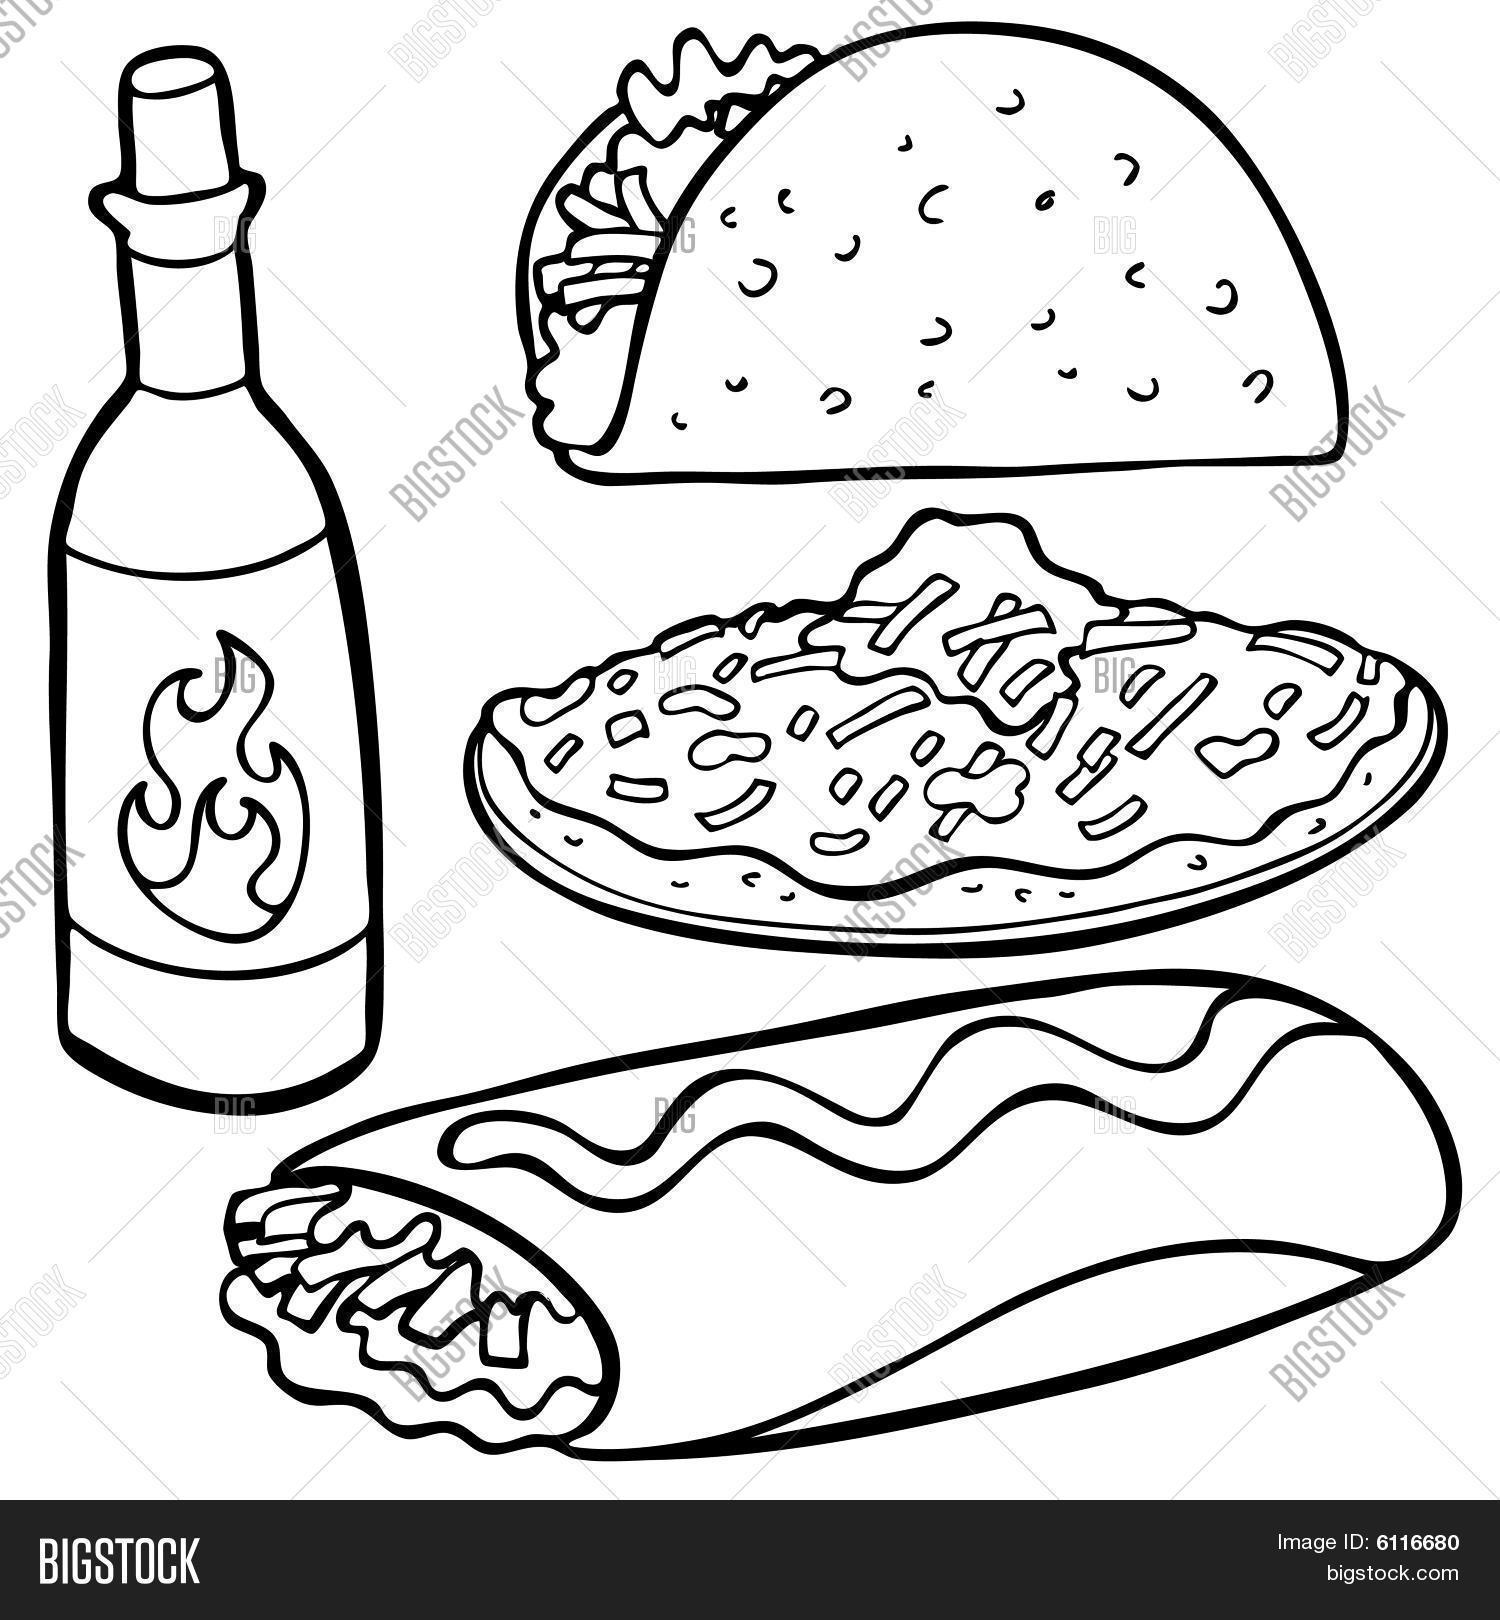 1500x1620 Mexican Food Items Line Art Vector amp Photo Bigstock